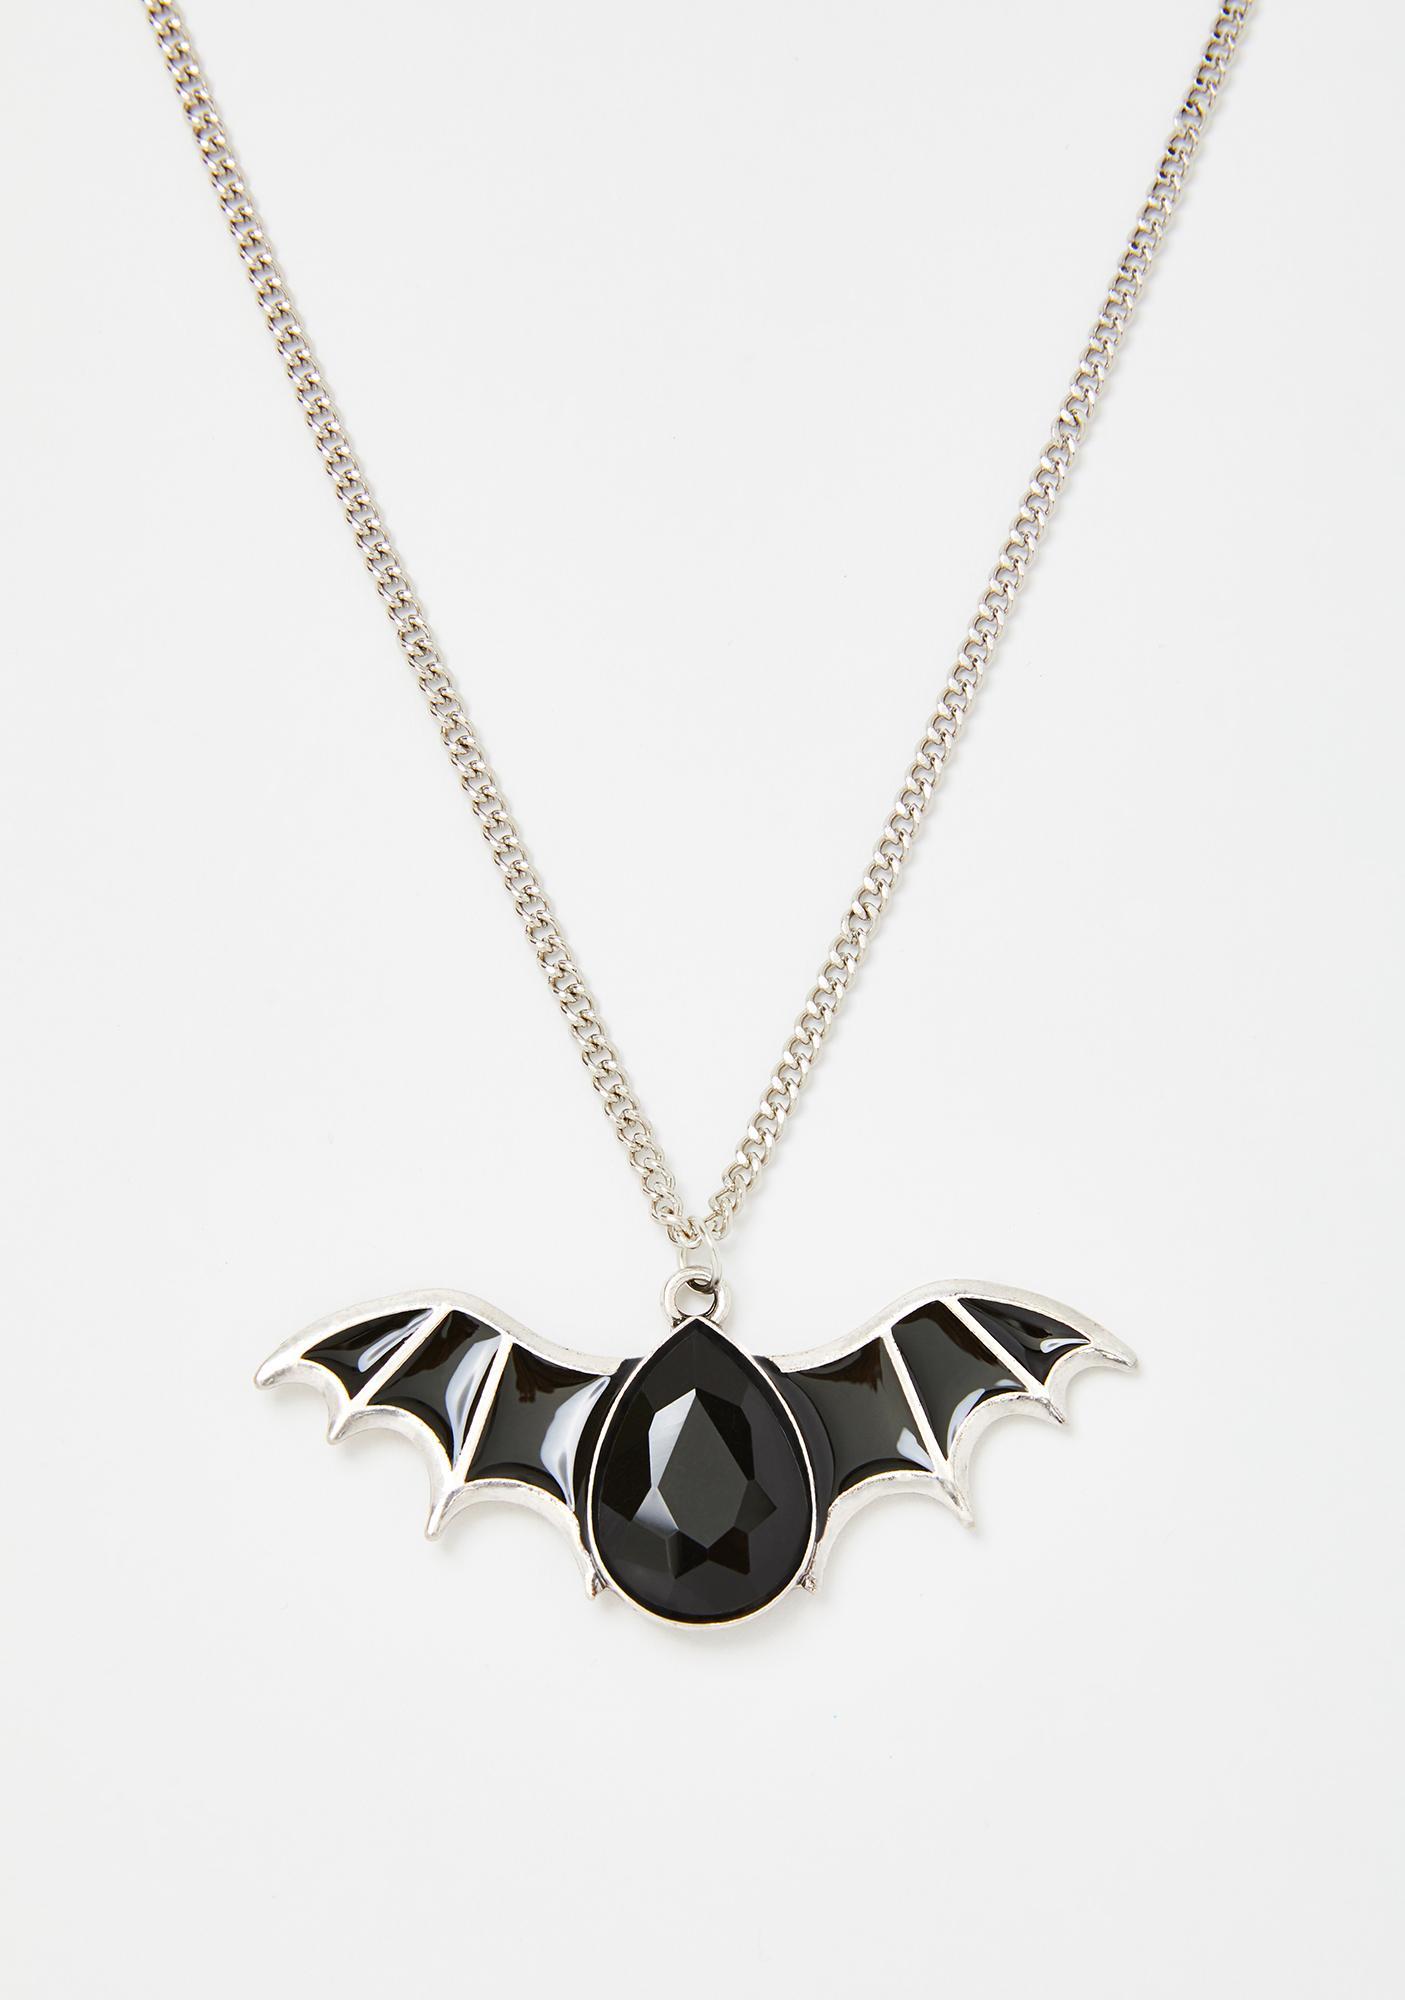 Earthly Gem Bat Necklace